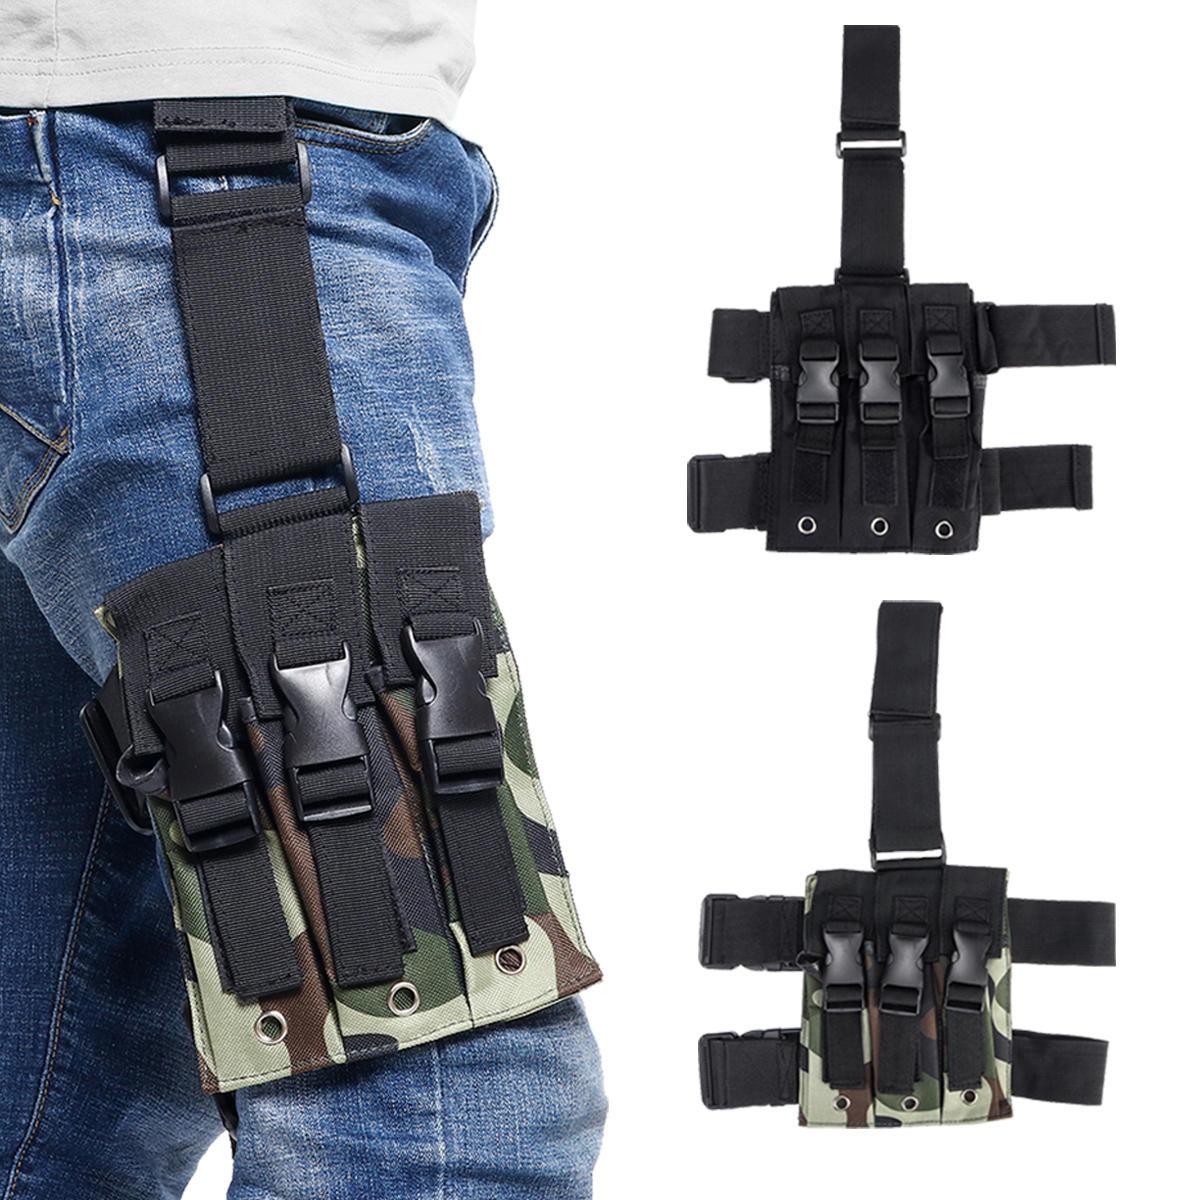 New Men Canva Tactical Motorcycle Riding Hip Fanny Pack Waist Thigh Drop Leg Bag